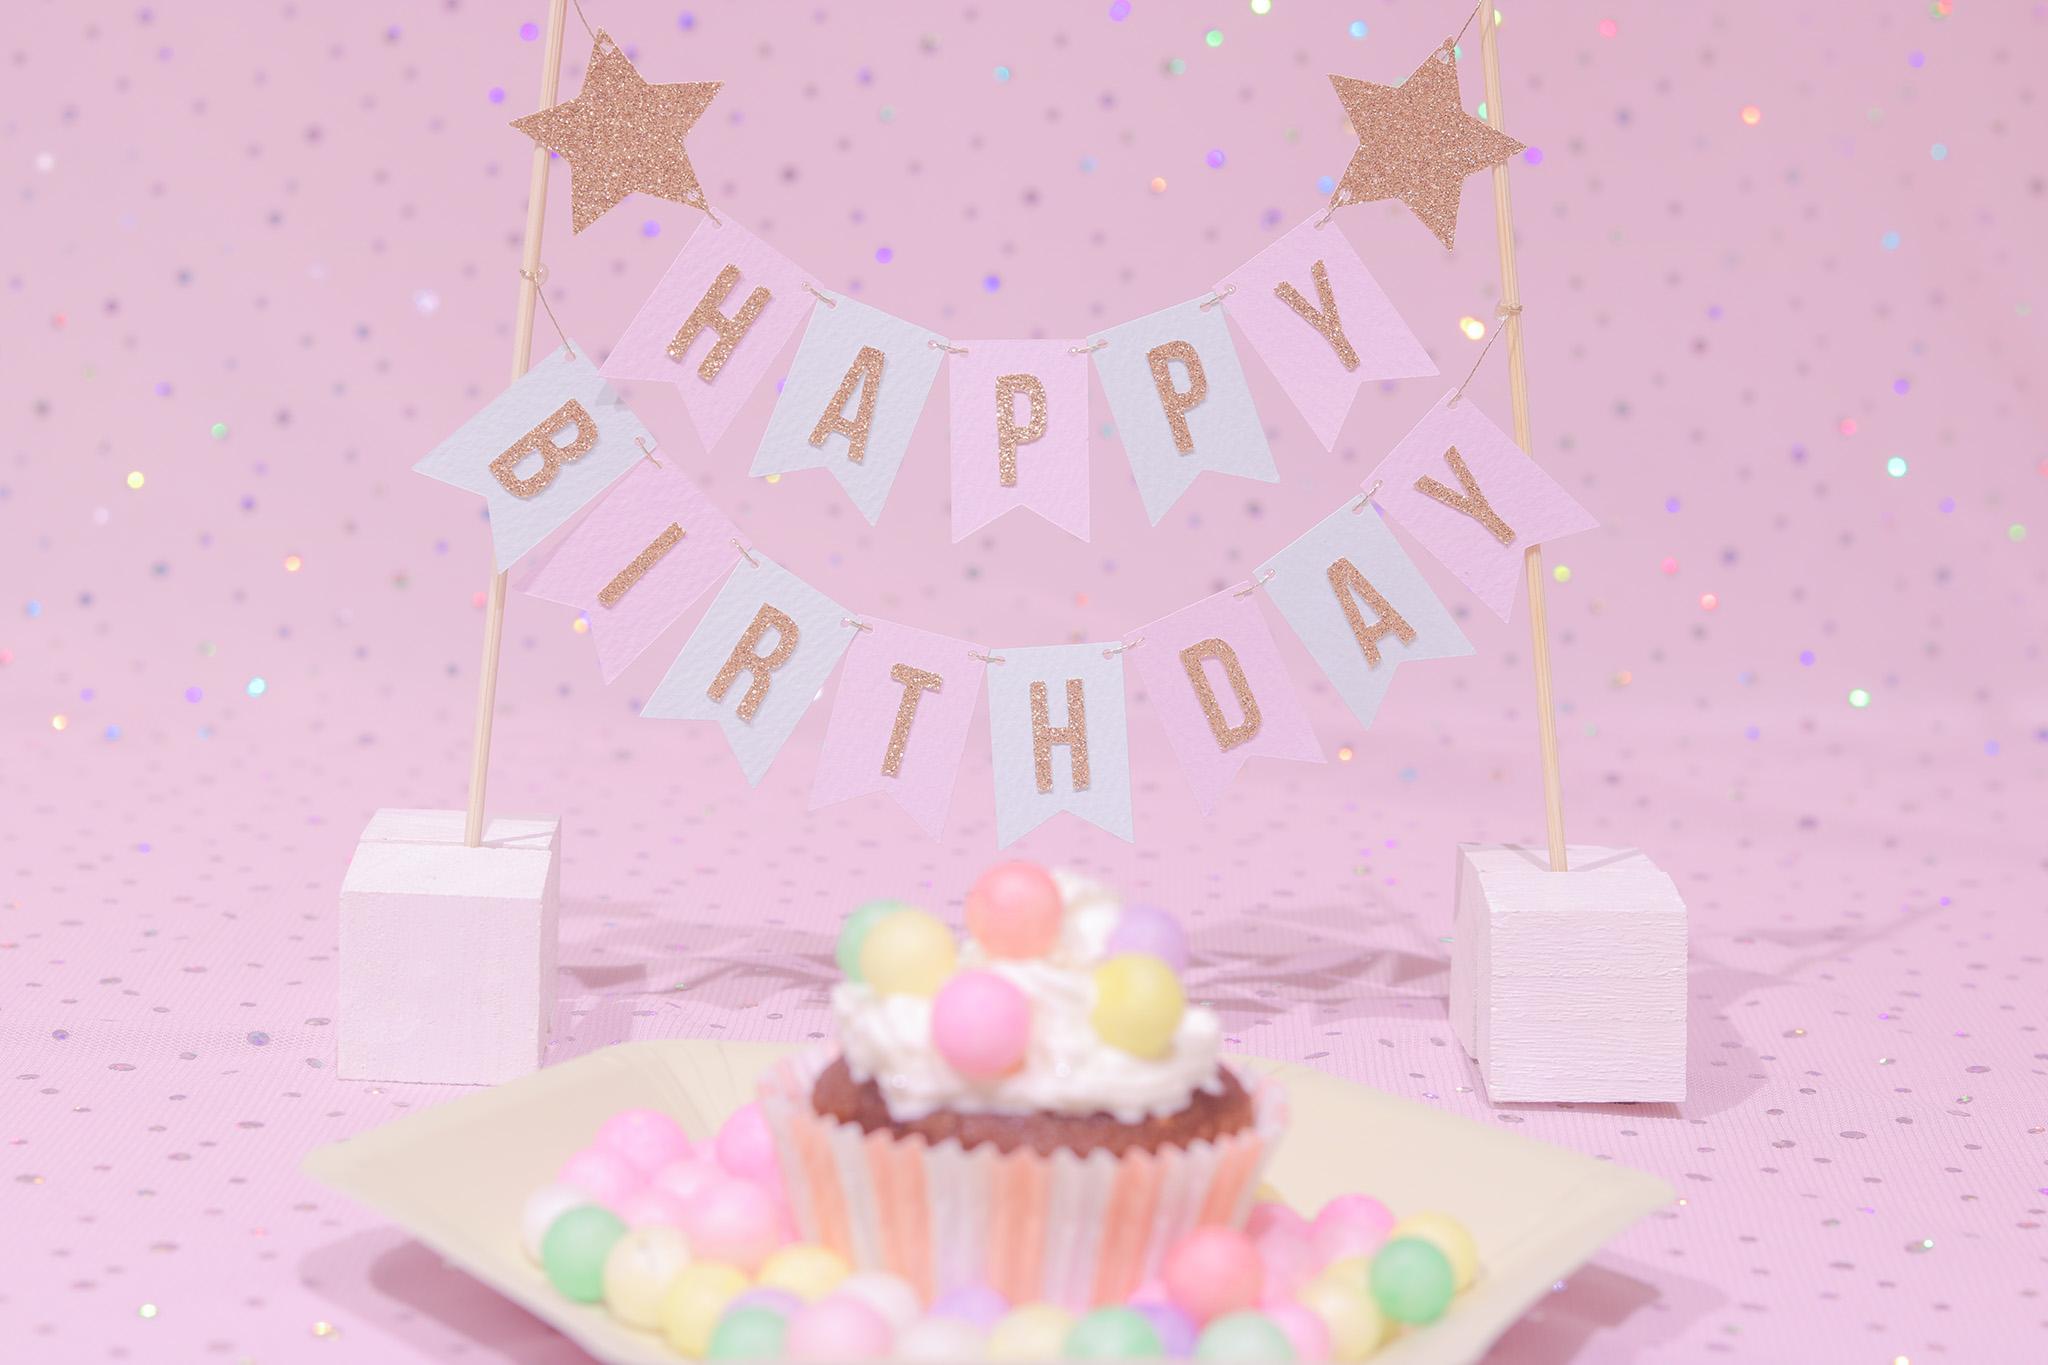 「HAPPY BIRTHDAY」「おいり」「おめでとう」「お祝い」「お誕生日おめでとう」「カップケーキ」「ケーキ」「ケーキトッパー」「誕生日ケーキ」などがテーマのフリー写真画像